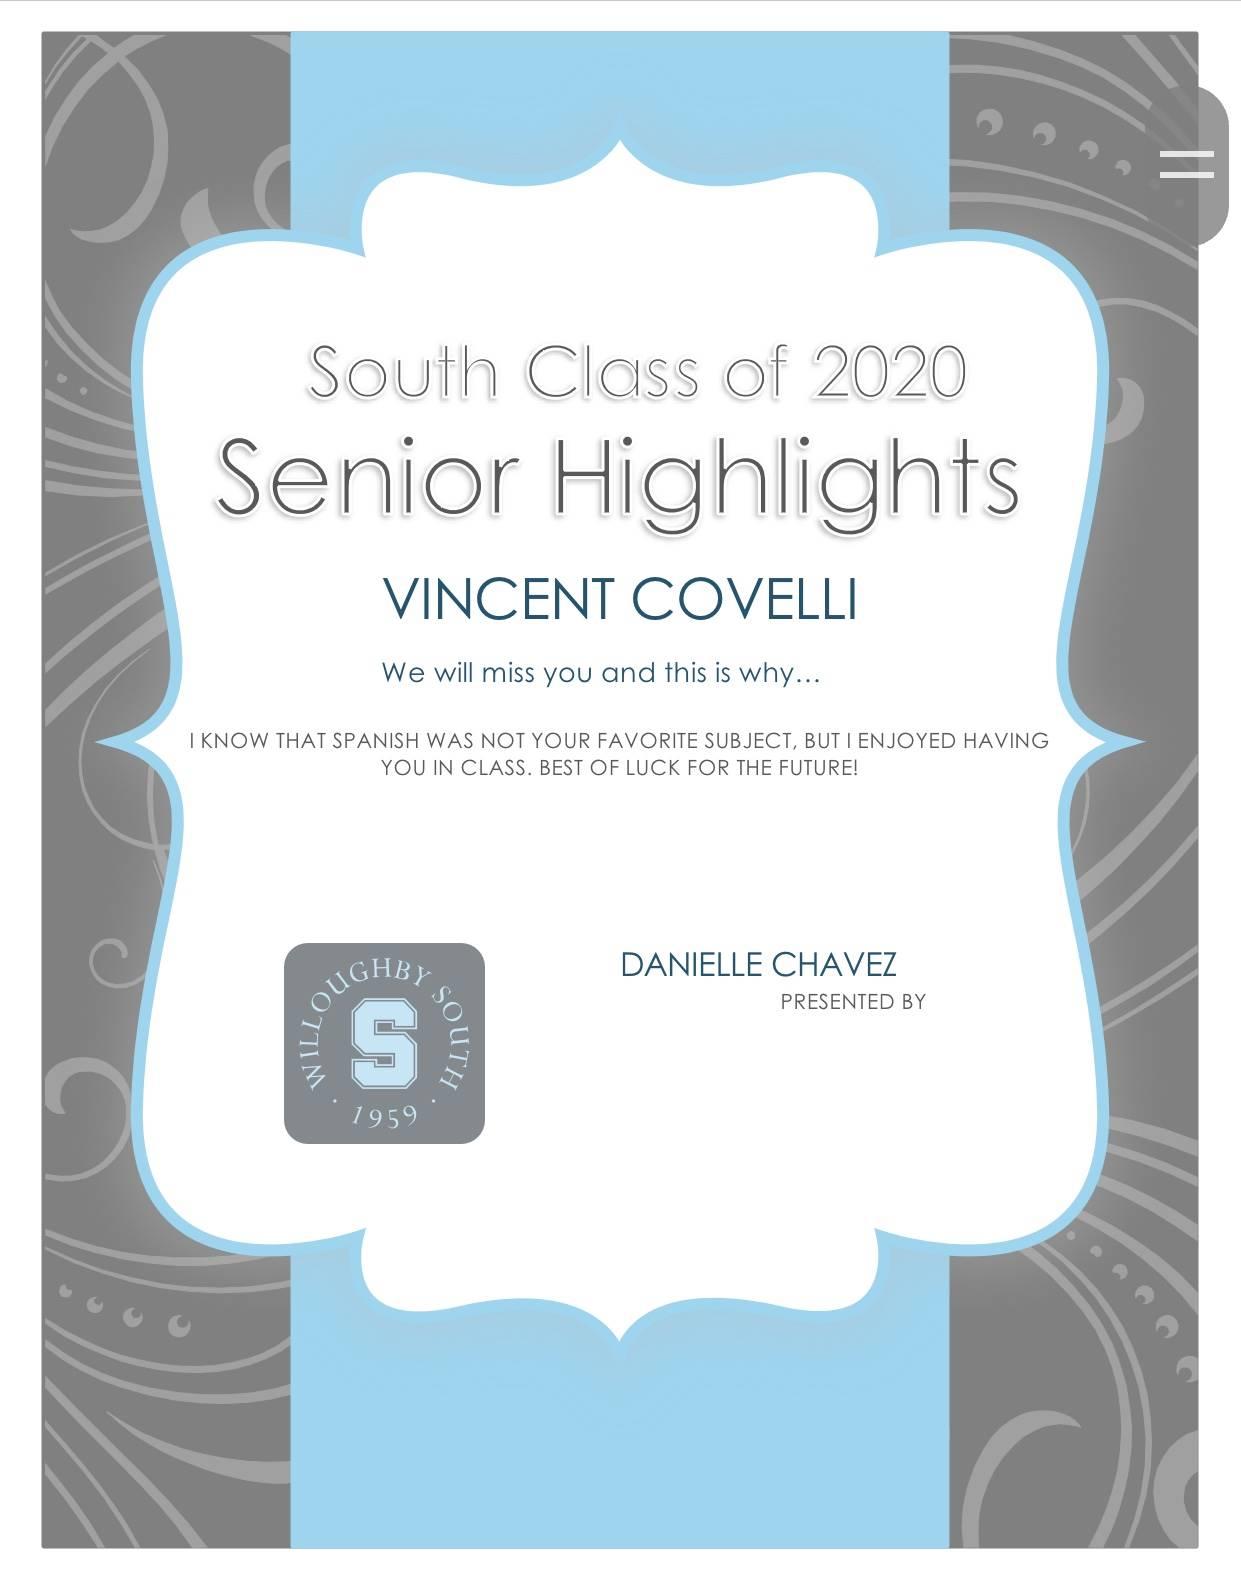 Vincent Covelli